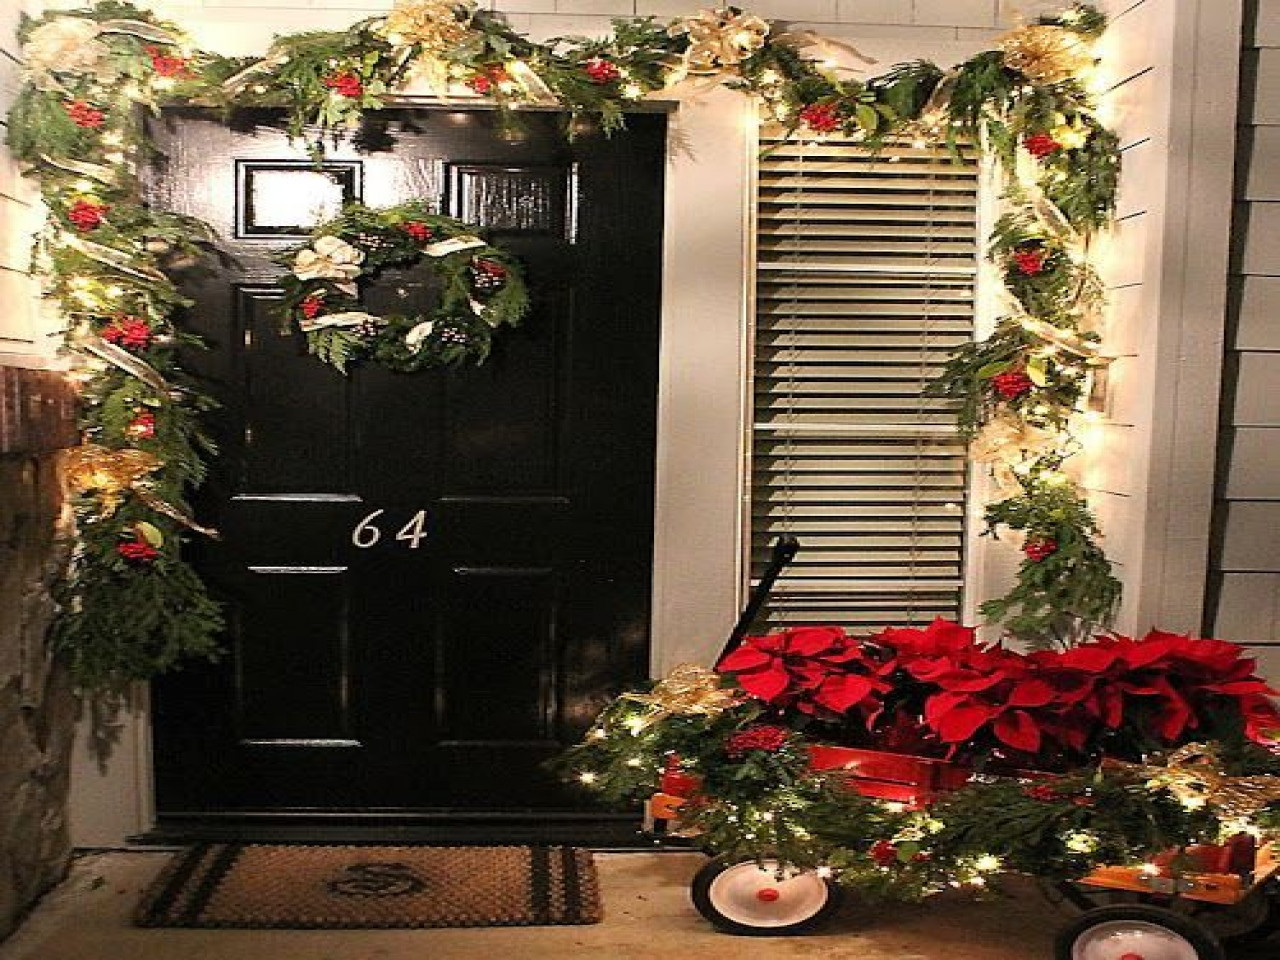 Apartment Patio Christmas Decorating Ideas  Apartment balcony christmas decorating ideas ideas with